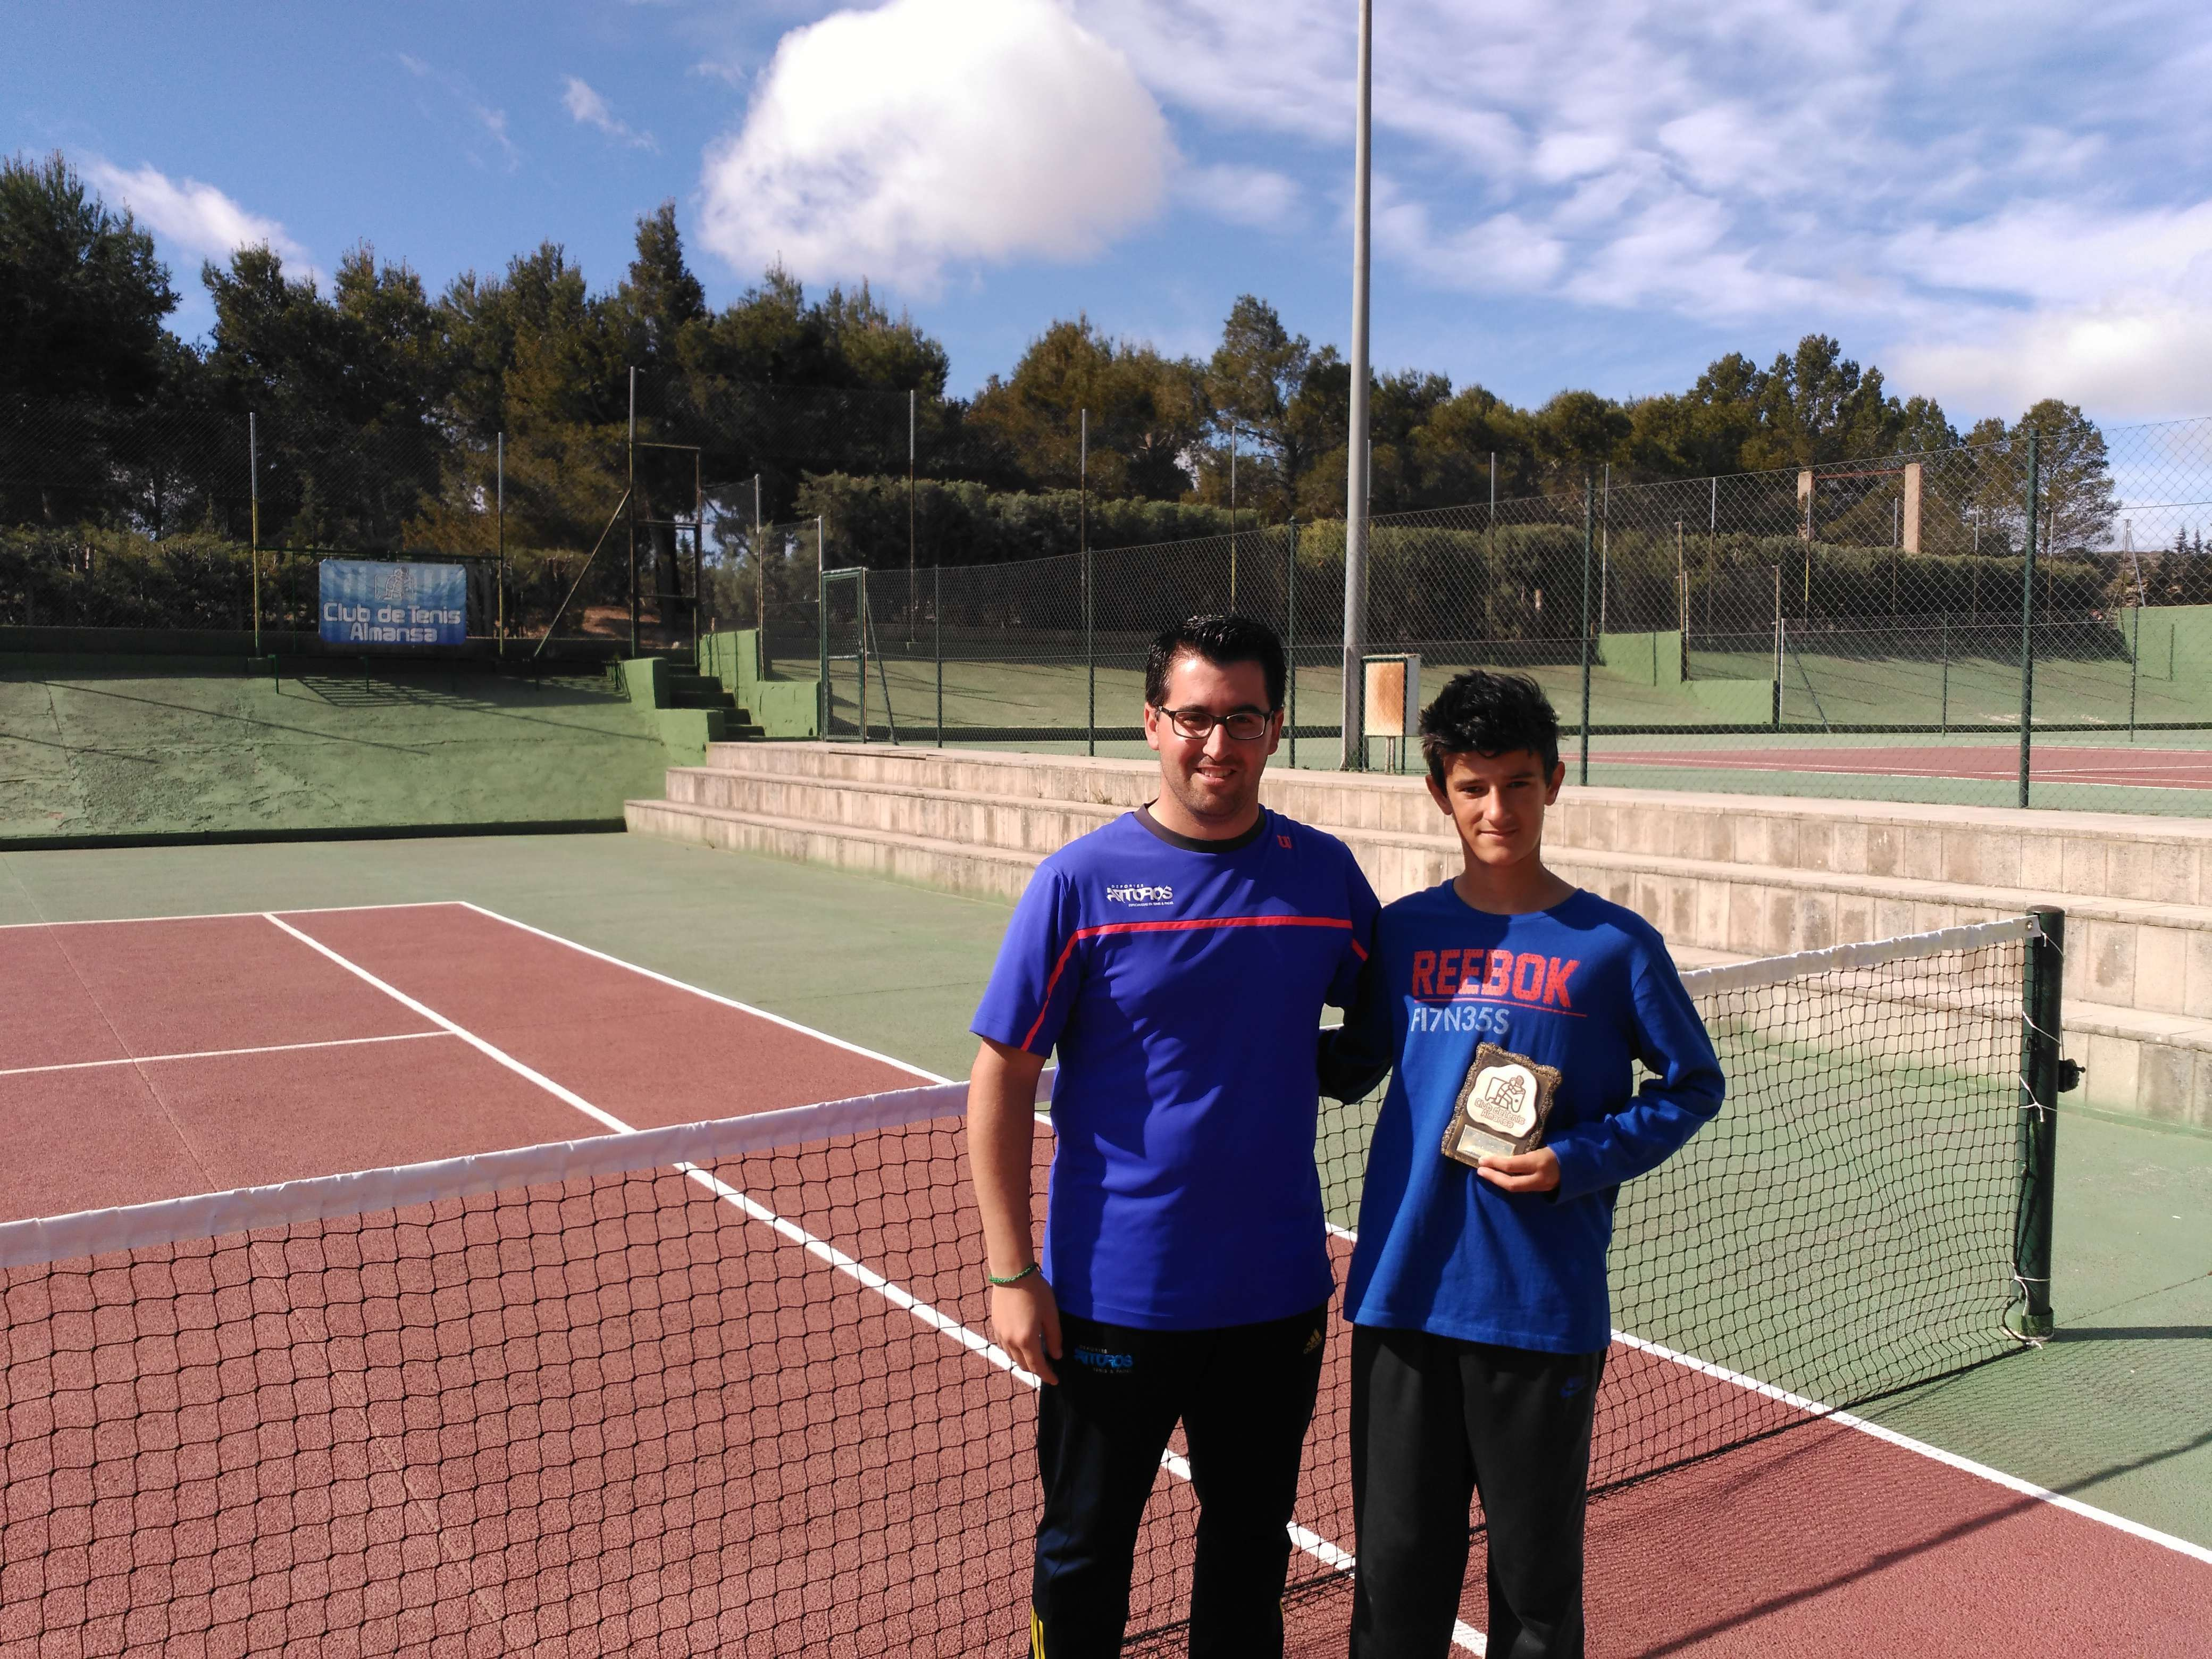 Campeones del xxxv torneo de tenis fiestas mayores - David llorens ...